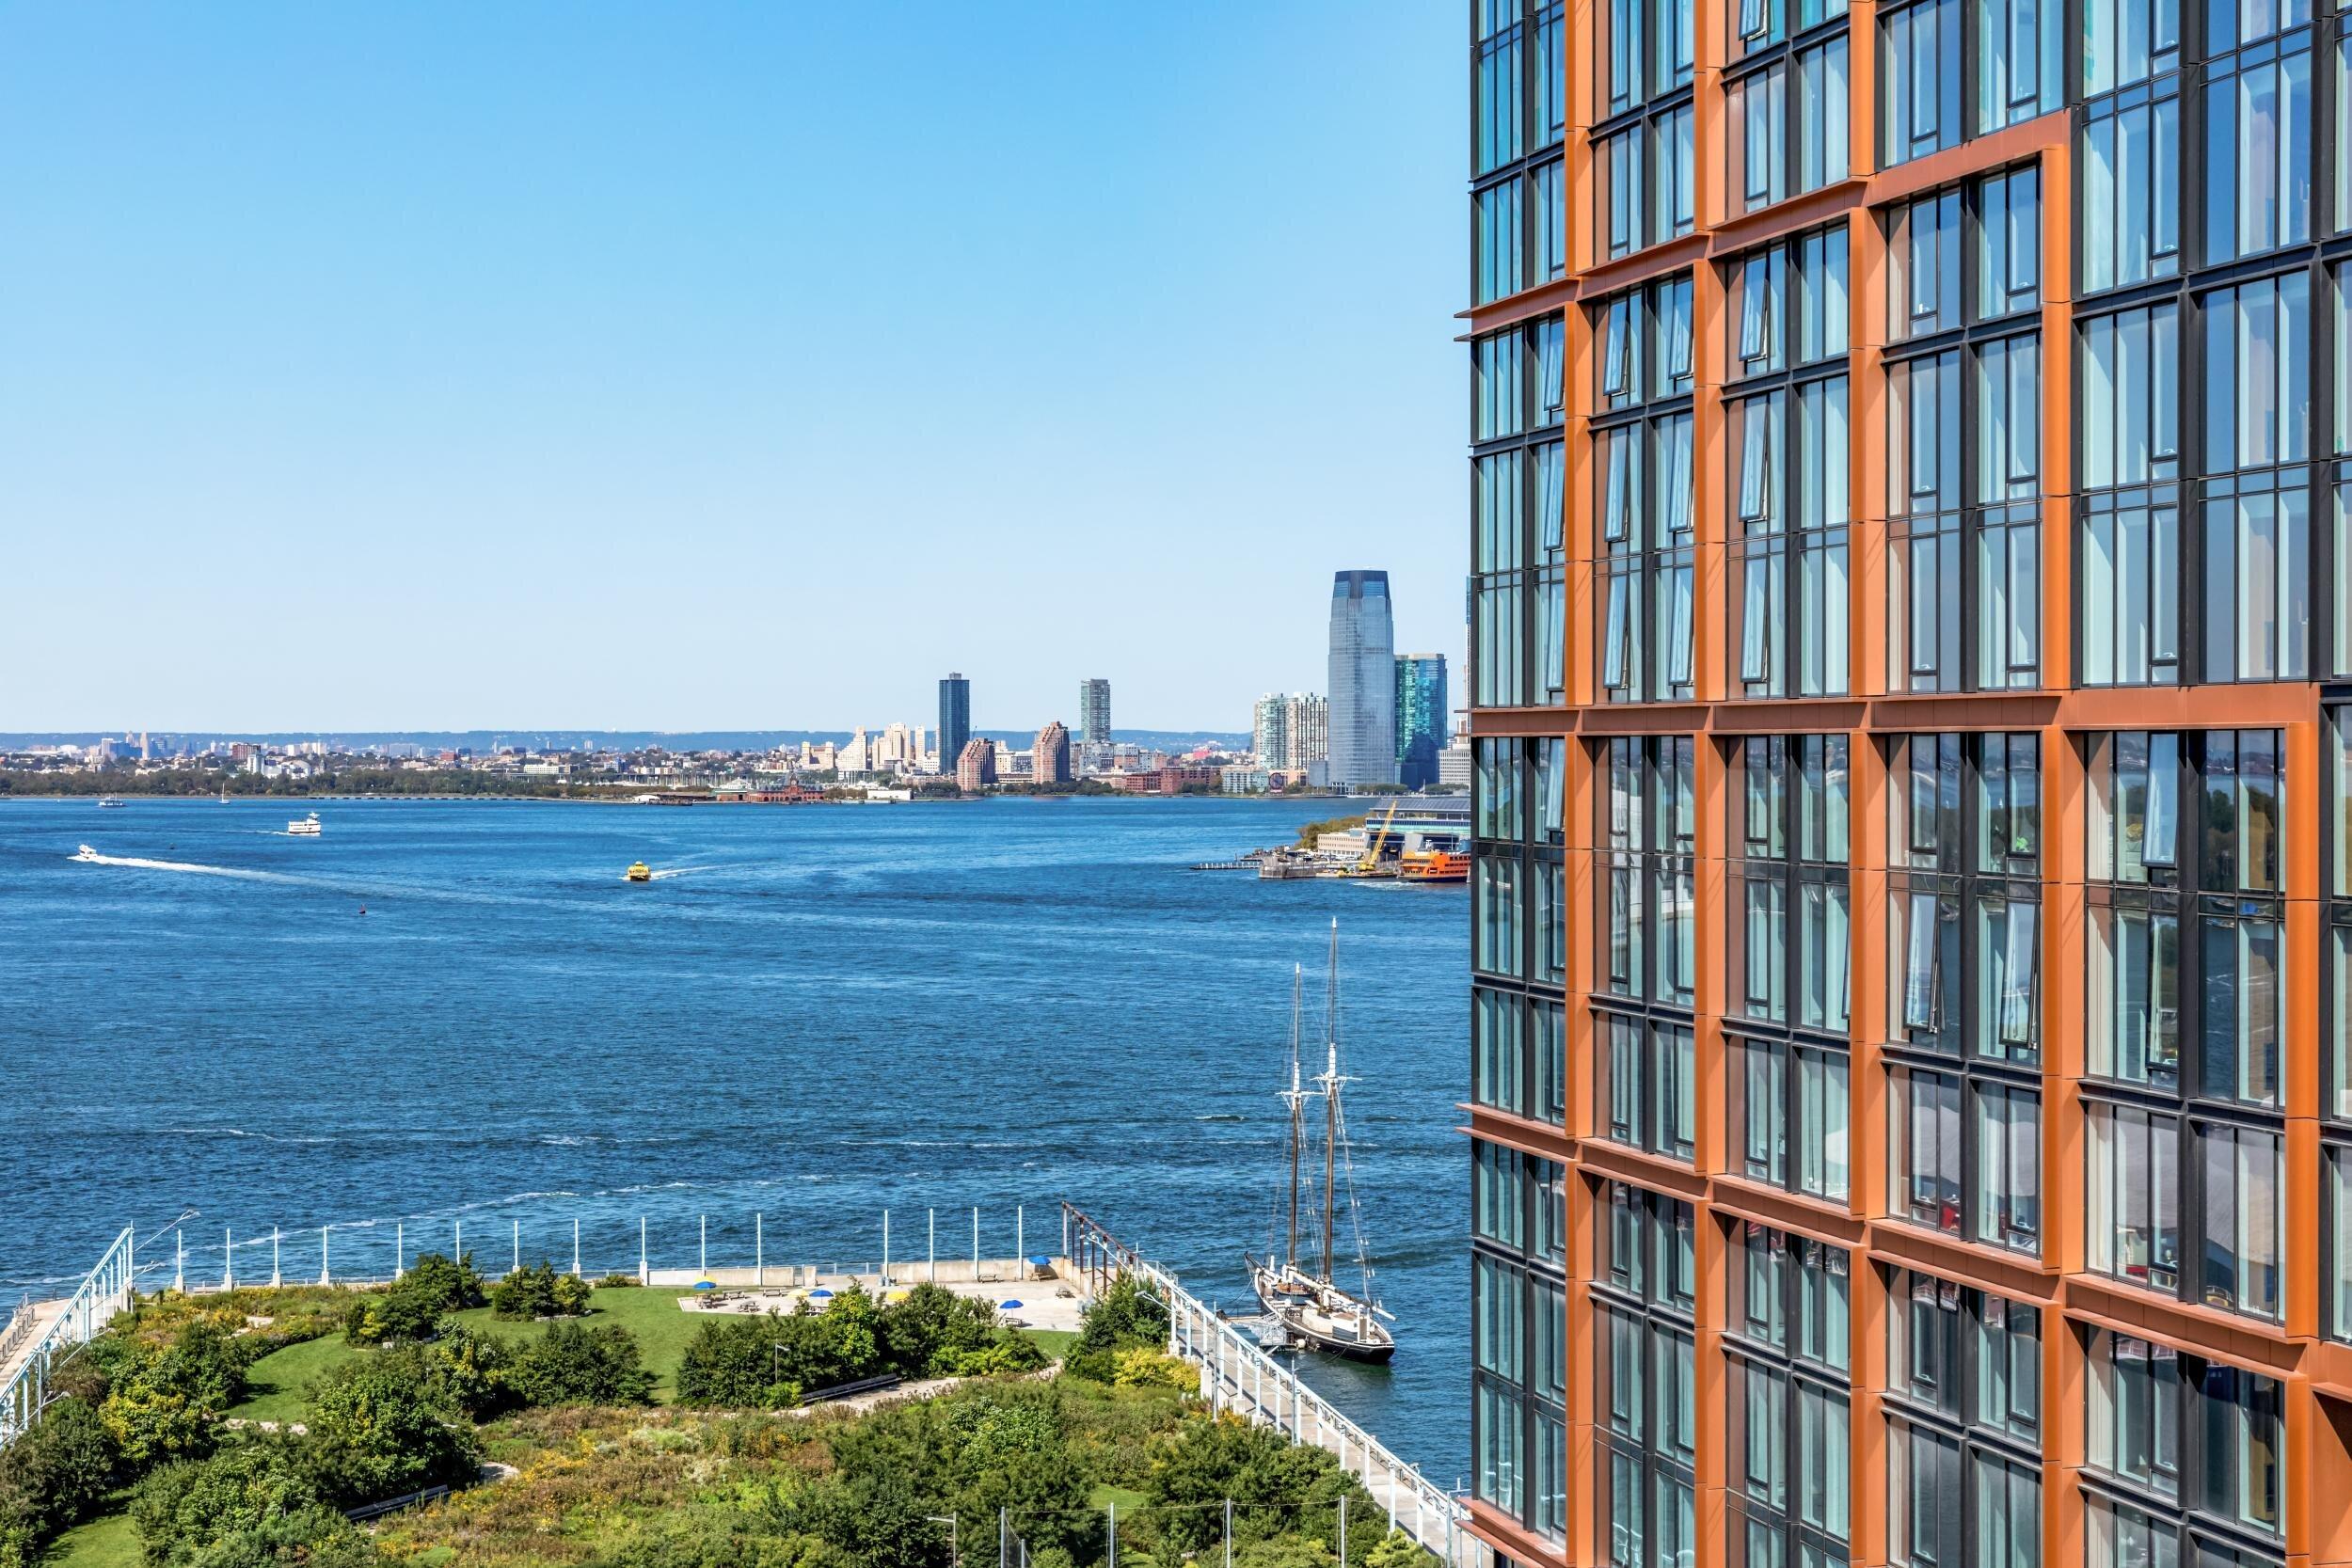 Marmol Radziner sprinkles SoCal style onto Brooklyn high rise Quay Tower